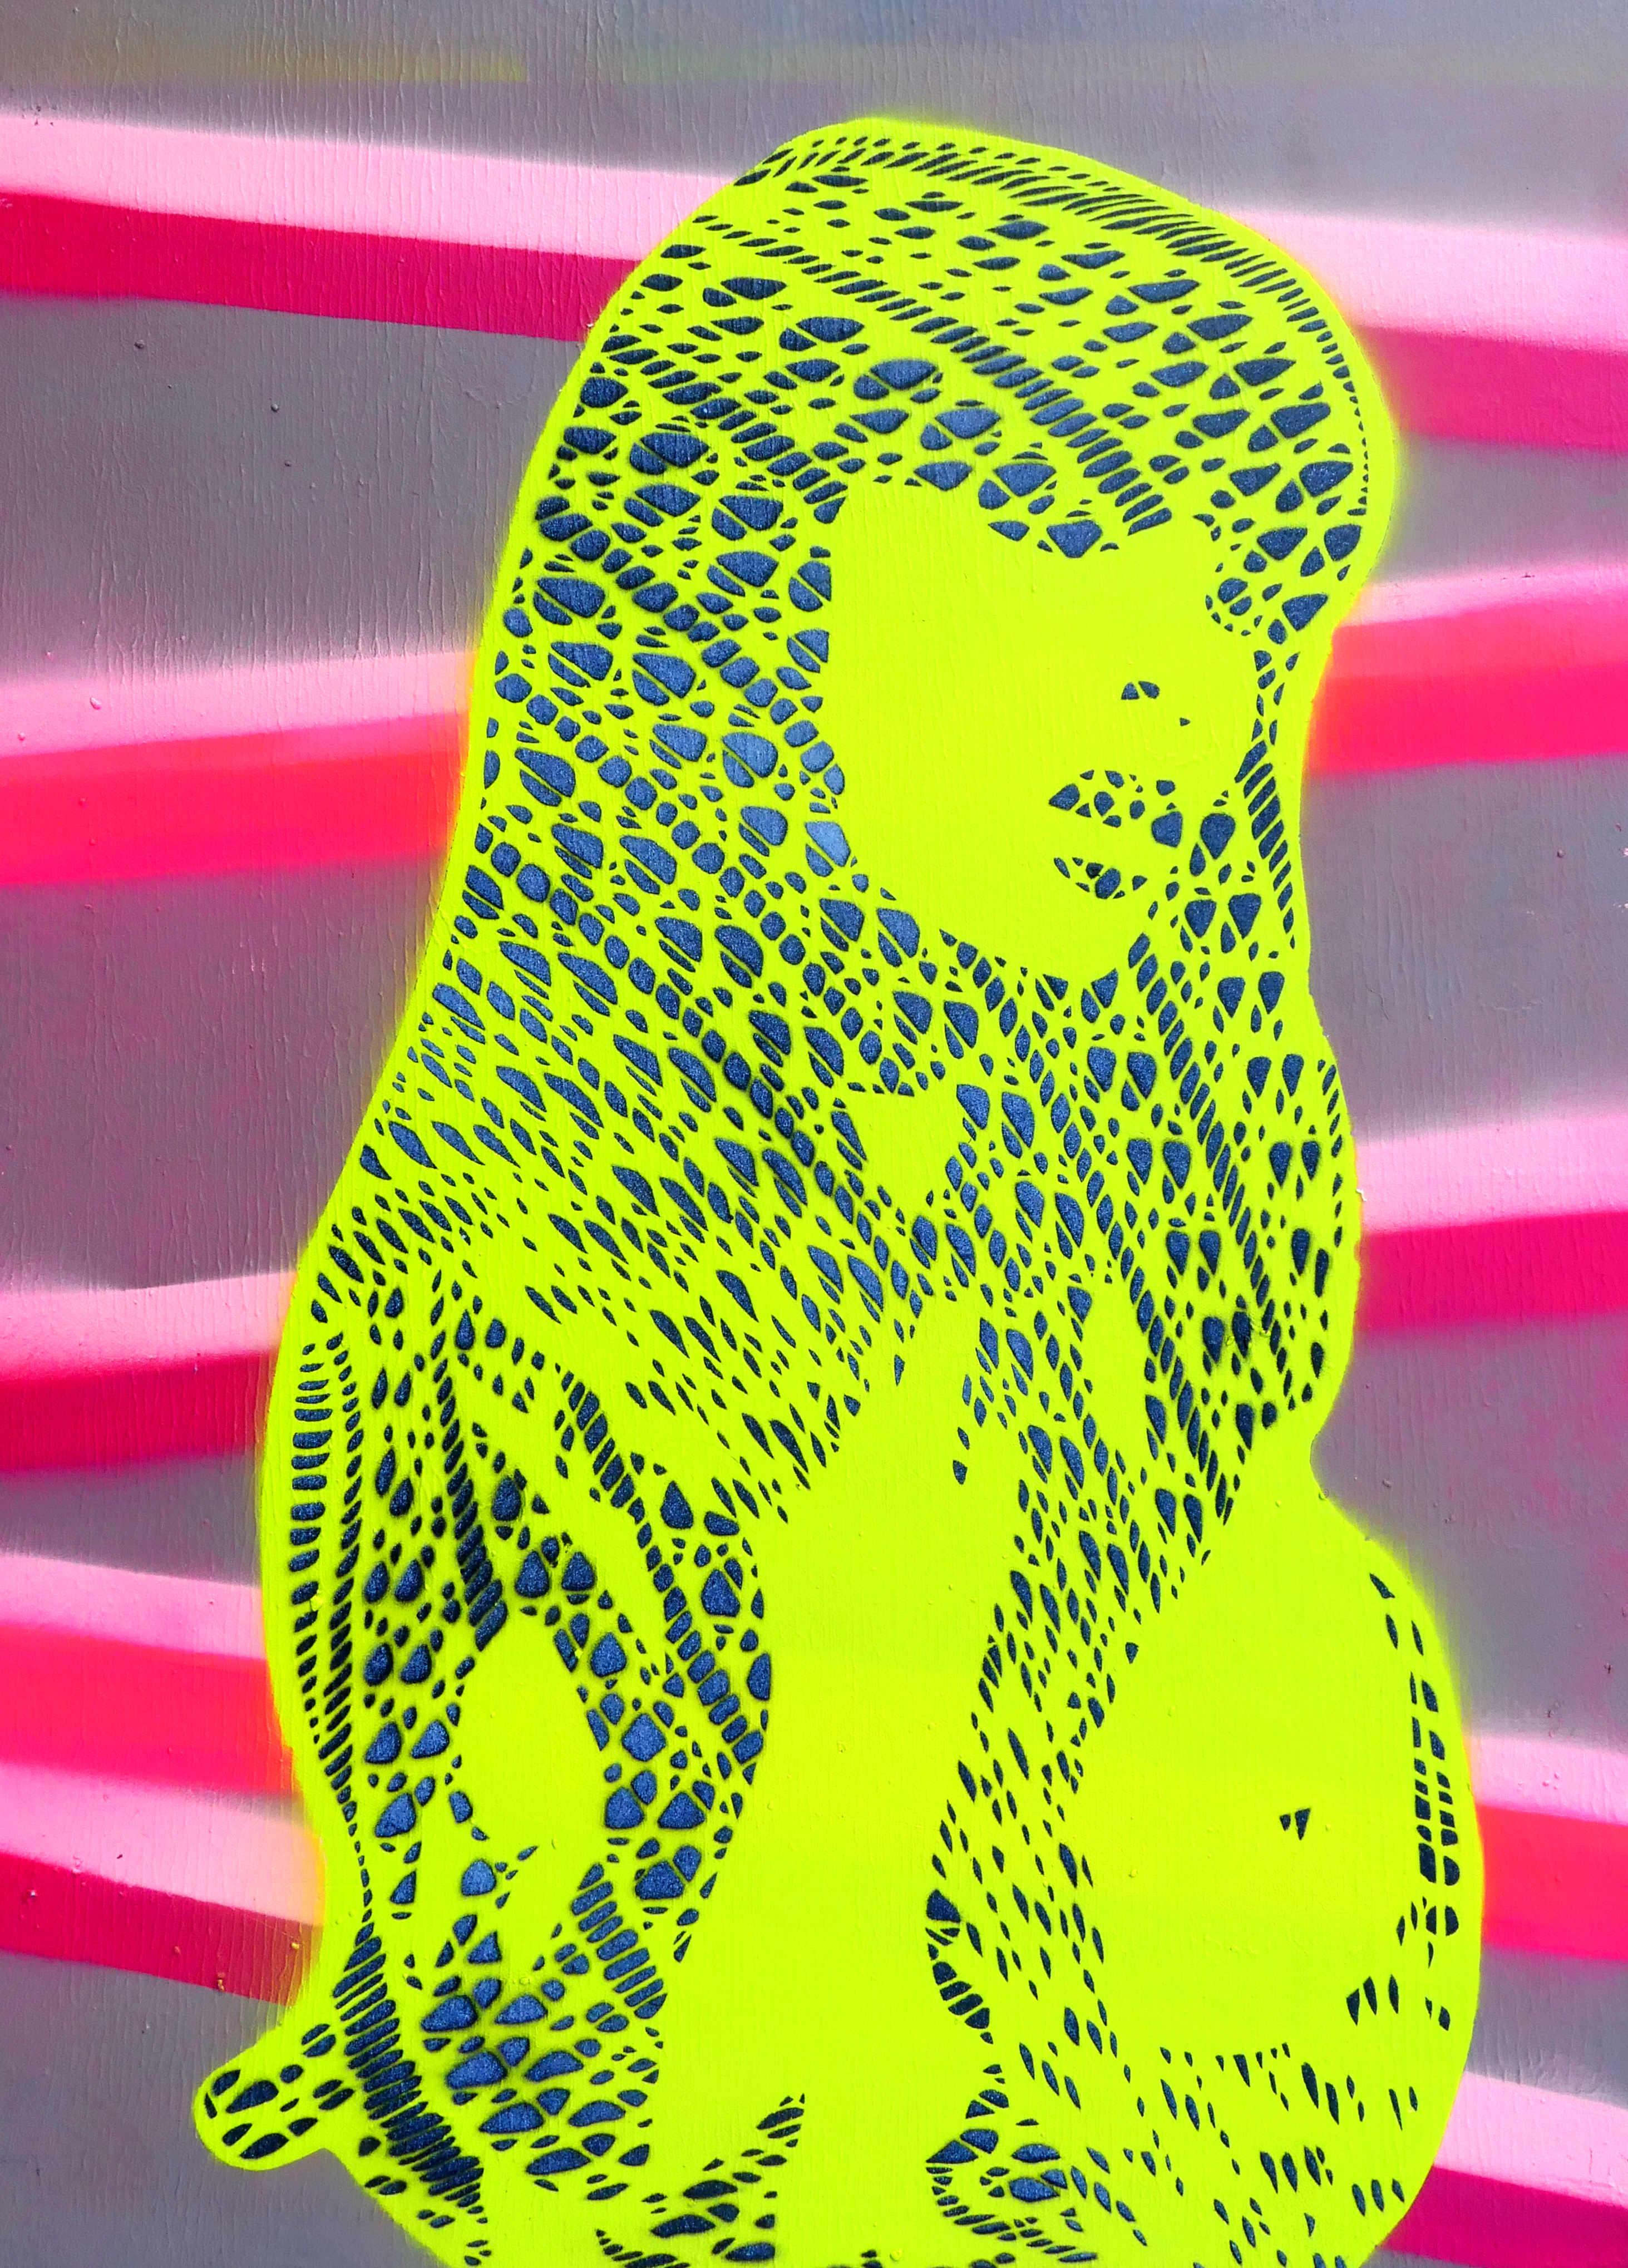 Stencil Artwork Ghost_2 fishnet tights